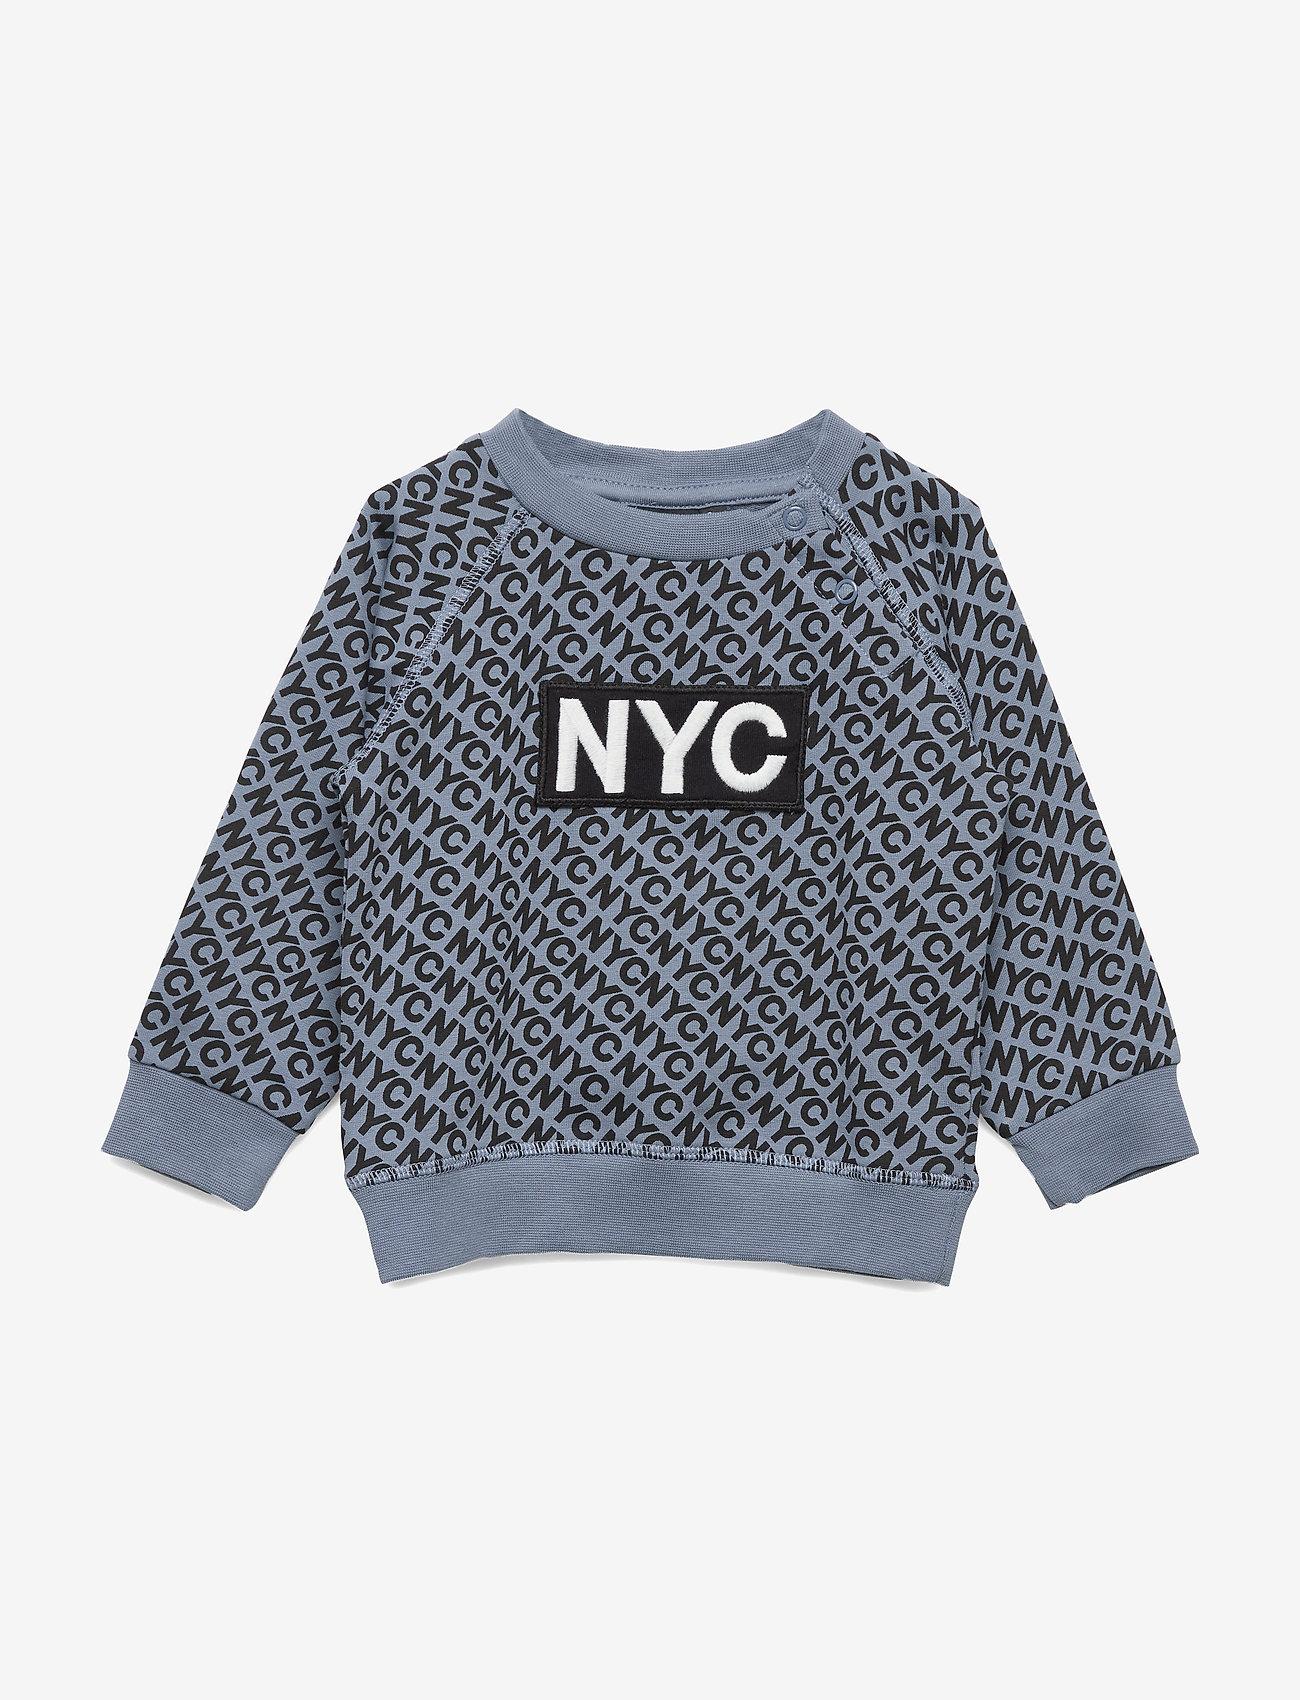 Petit by Sofie Schnoor - Sweat NYC - sweatshirts - dusty blue - 0